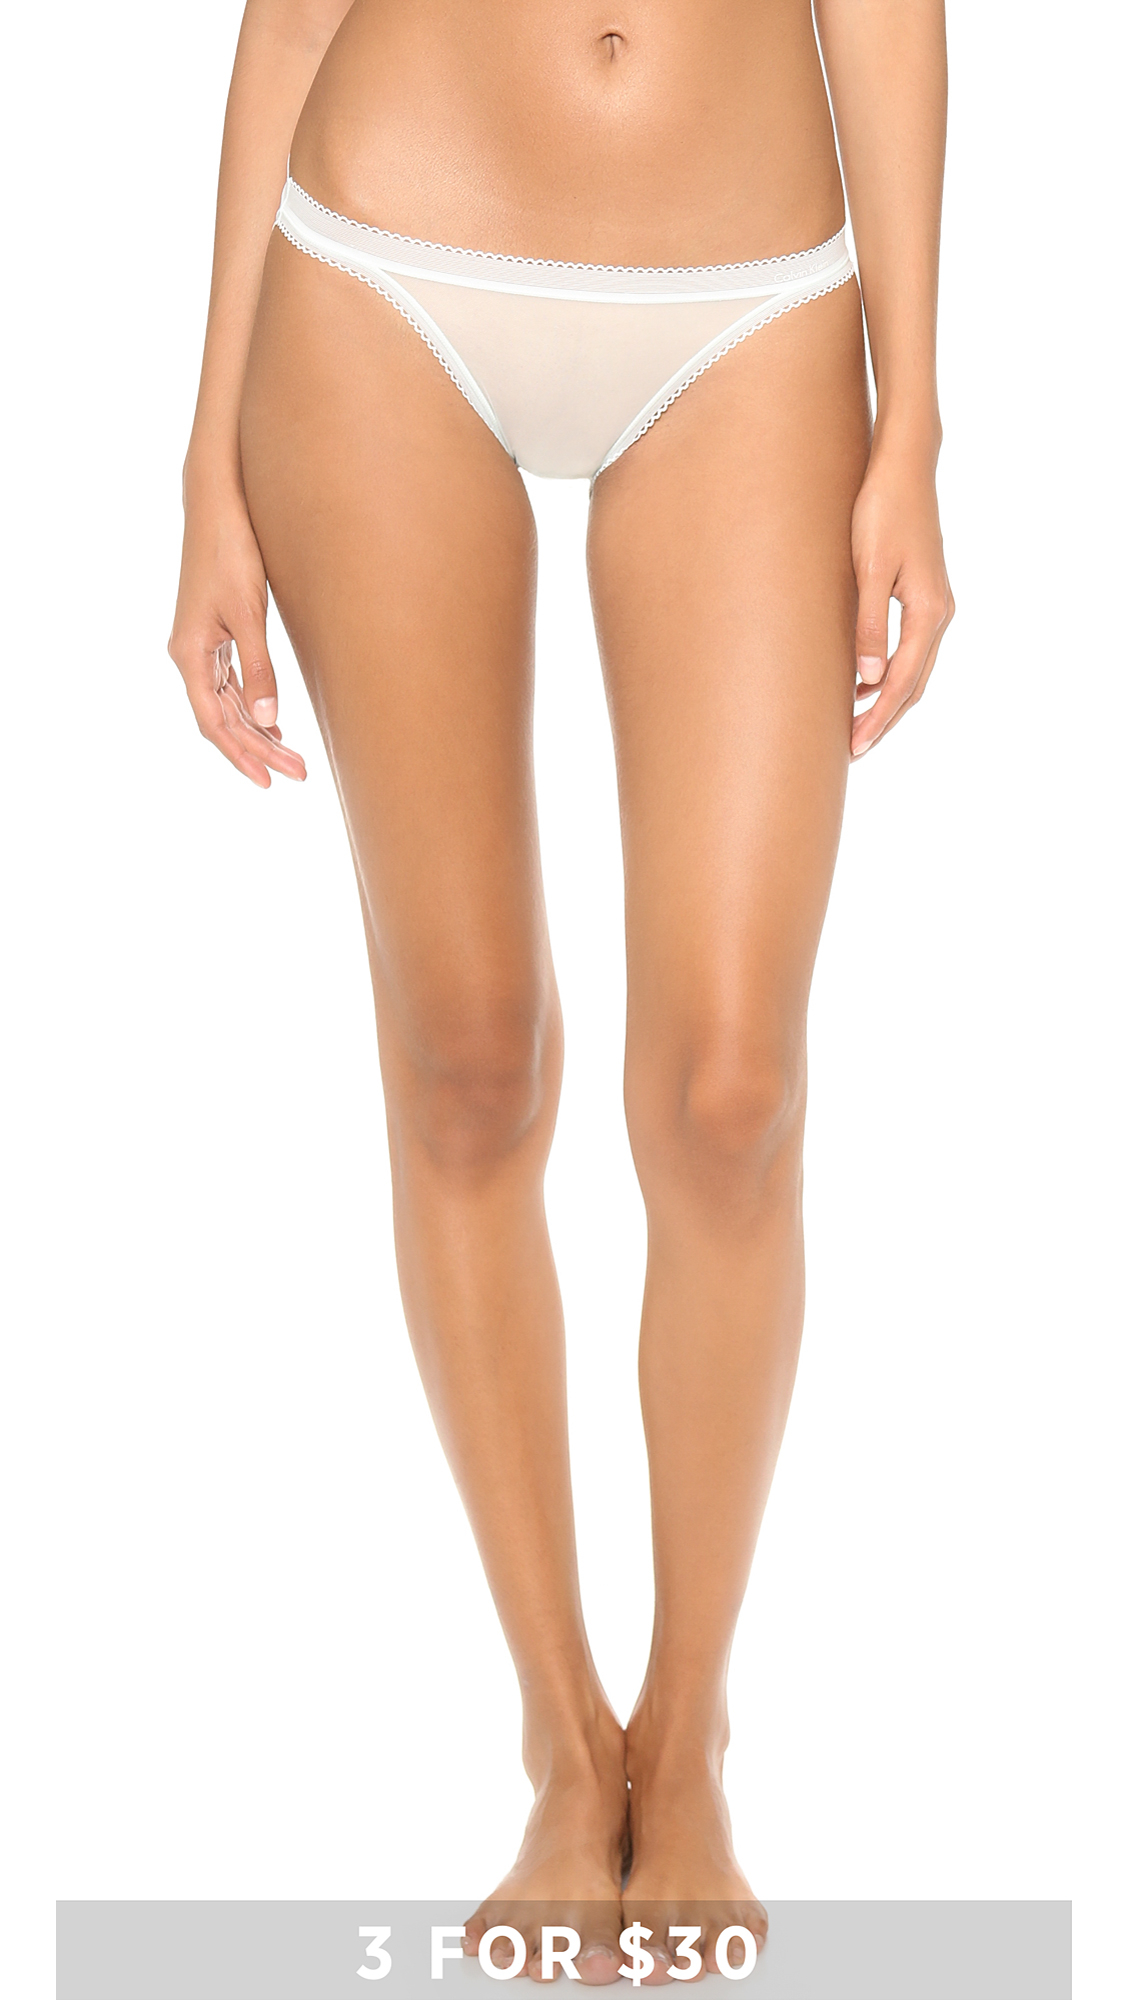 klein bikini panties Calvin